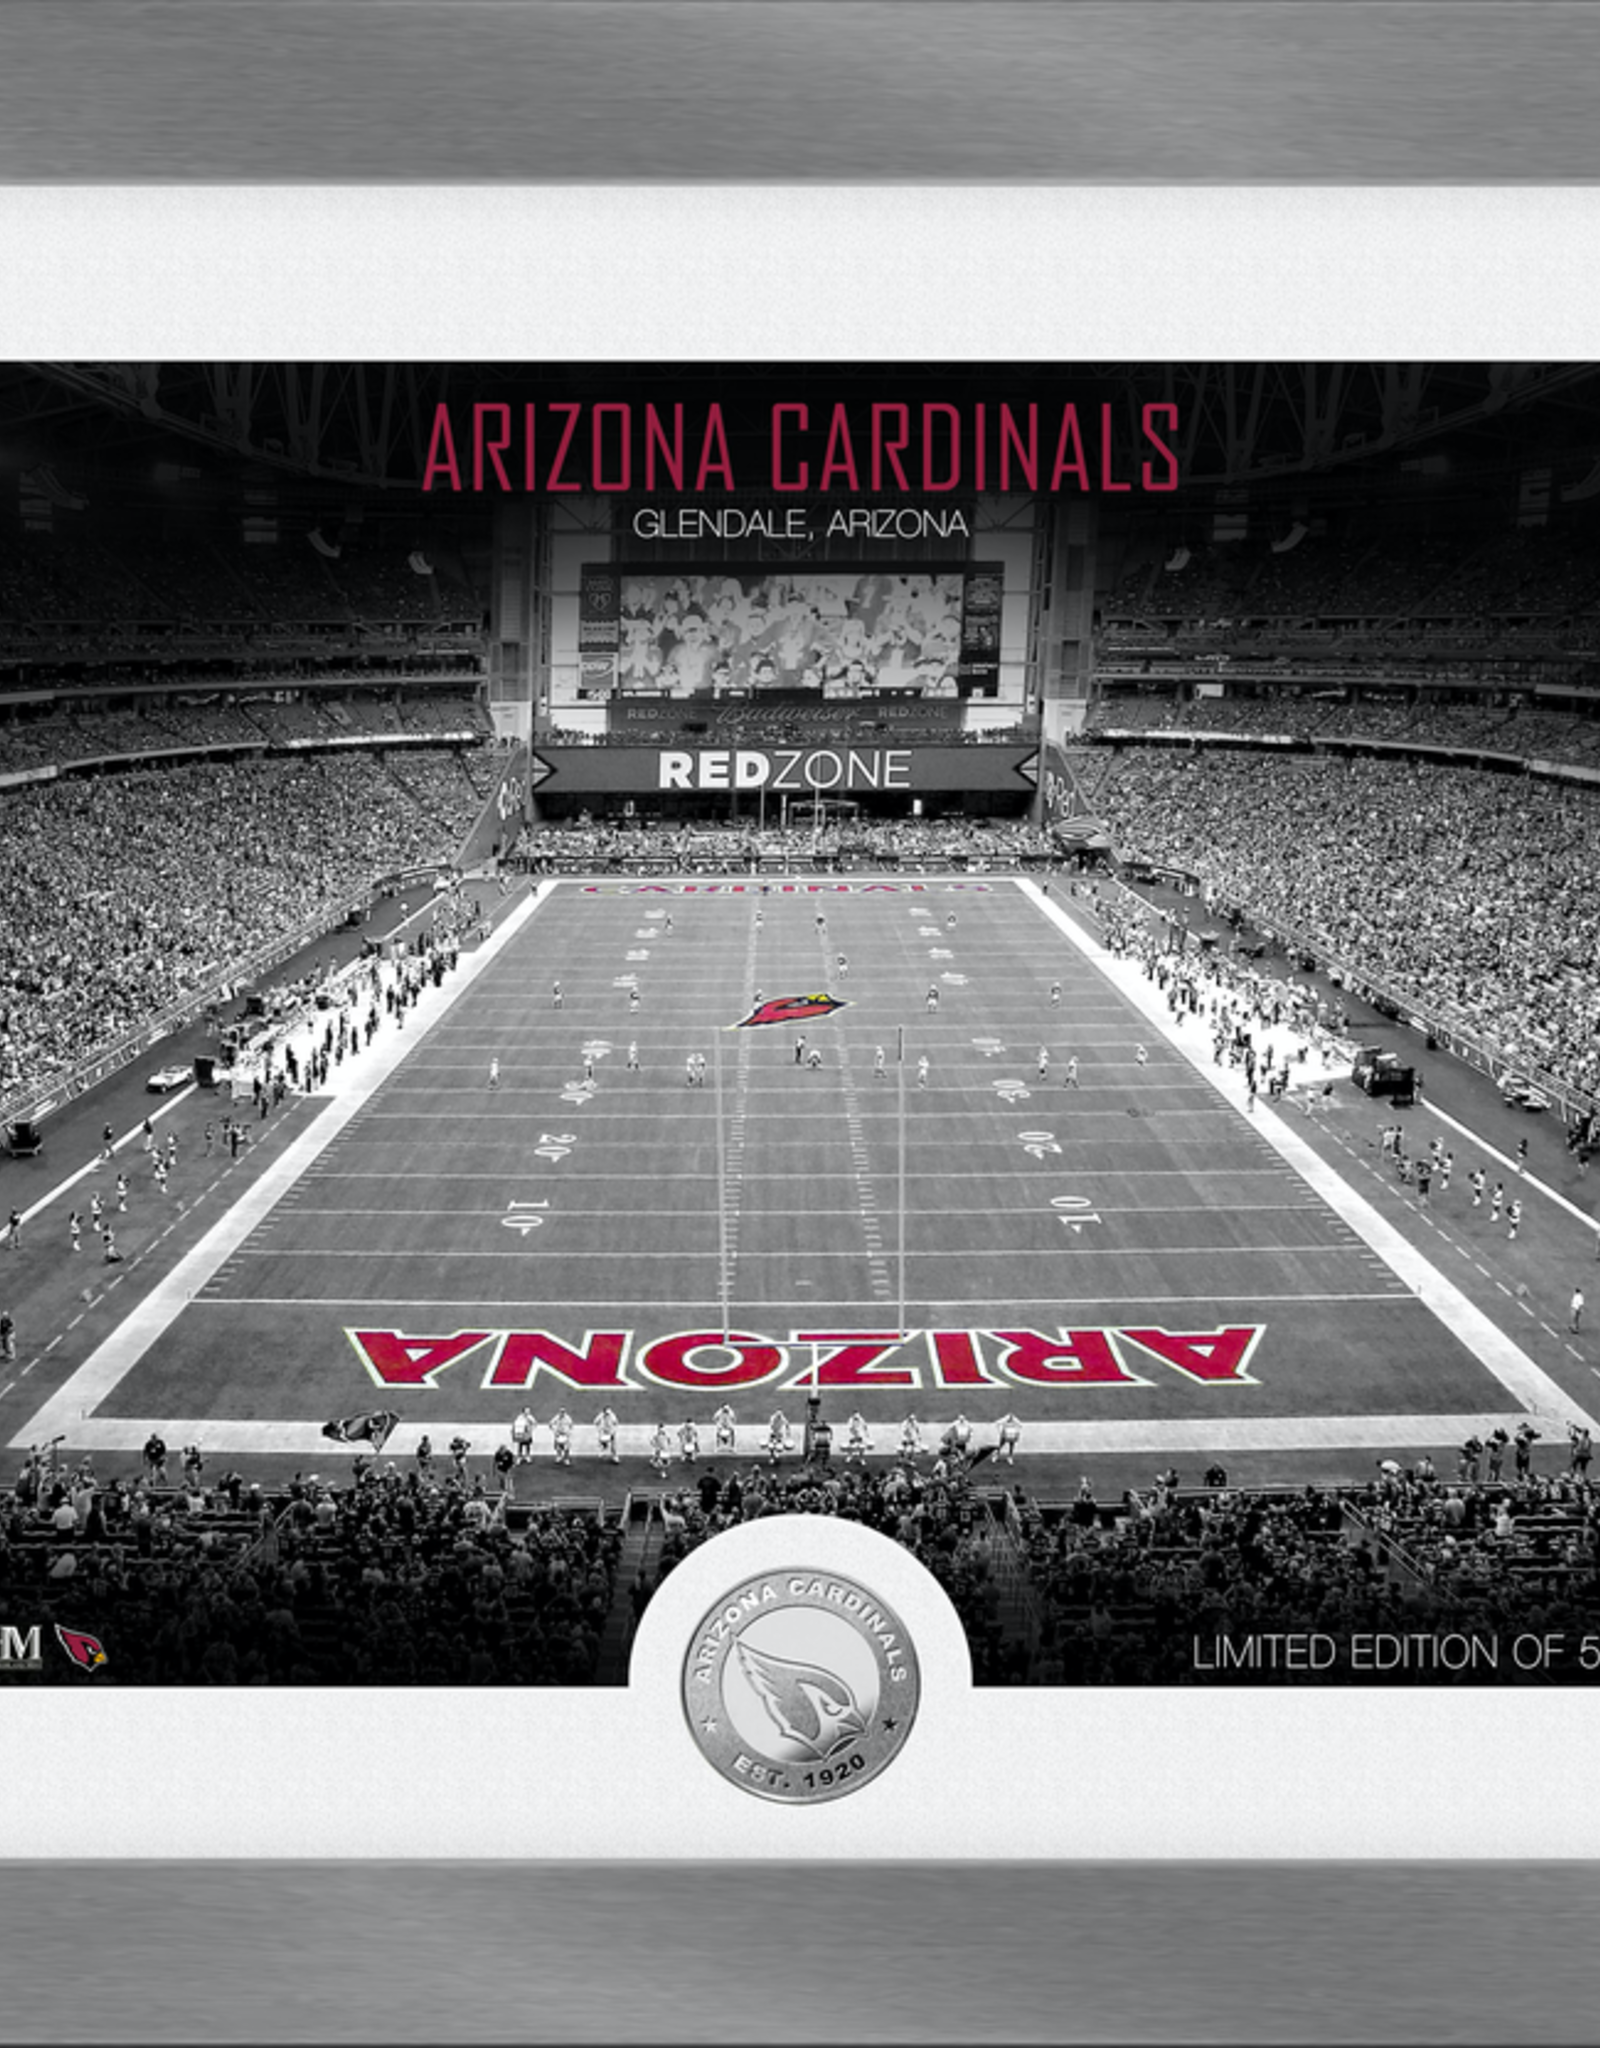 HIGHLAND MINT Arizona Cardinals Framed Art Deco Stadium with Silver Coin